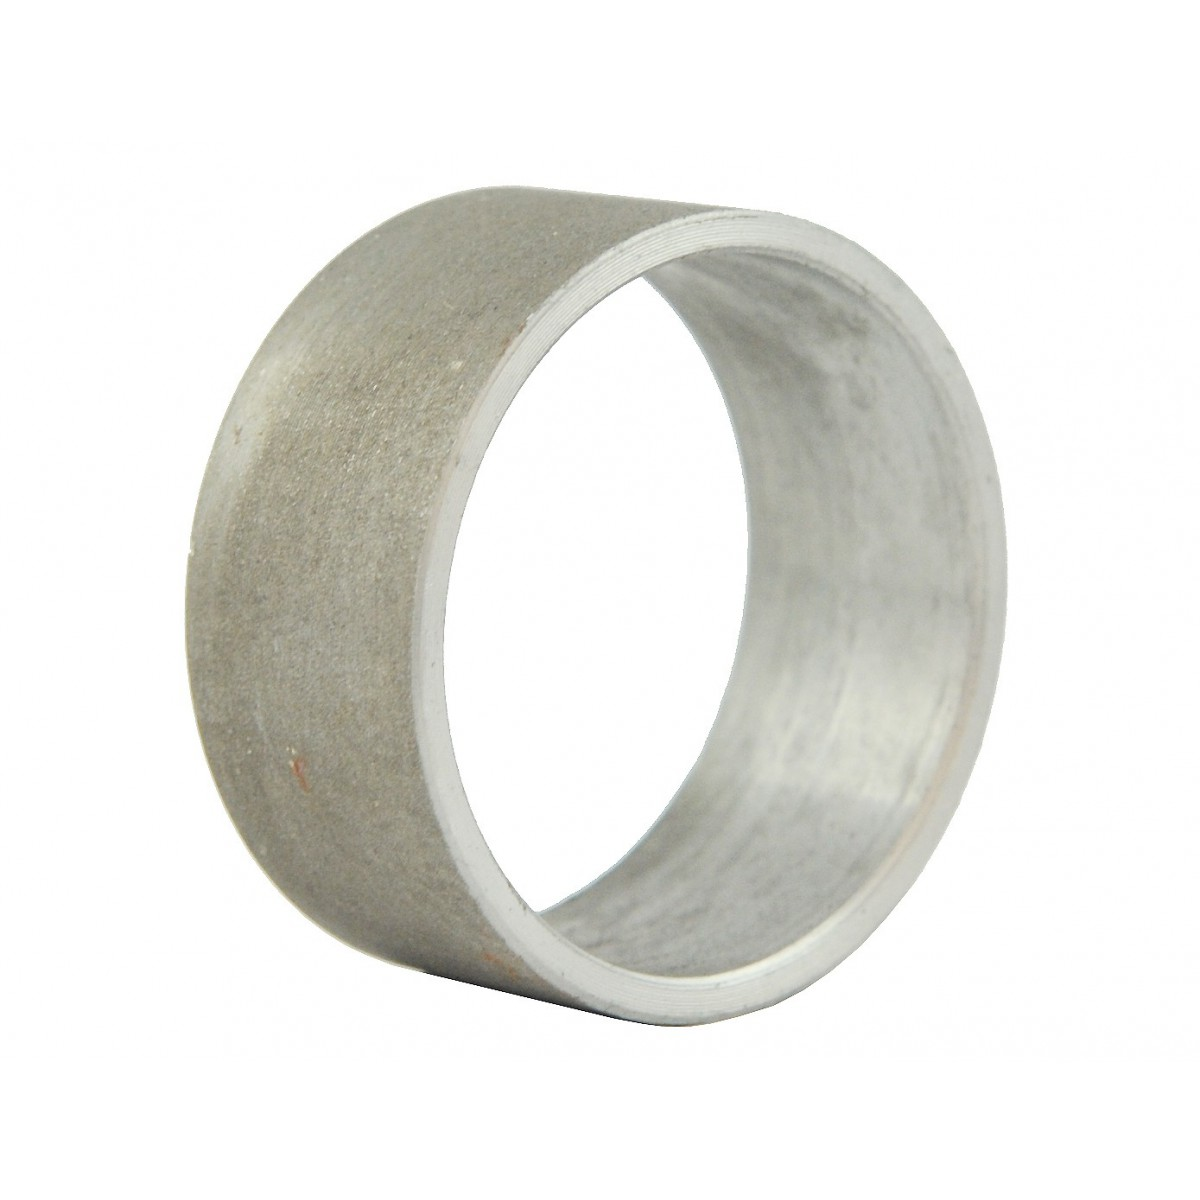 Sleeve bushing 40x45x20 mm ring